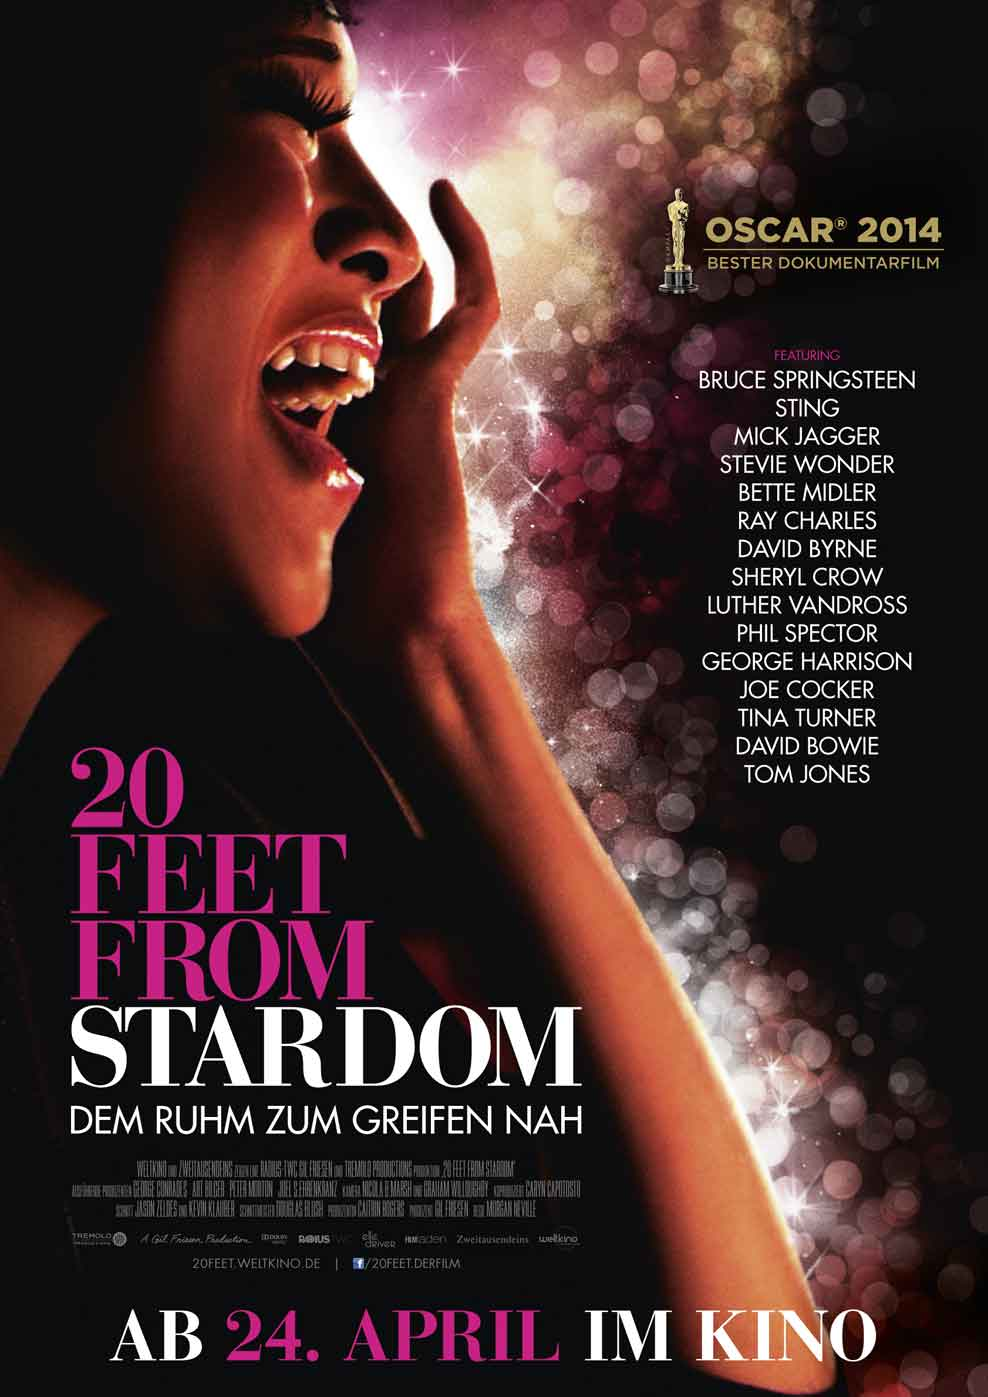 20 Feet From Stardom (Poster)